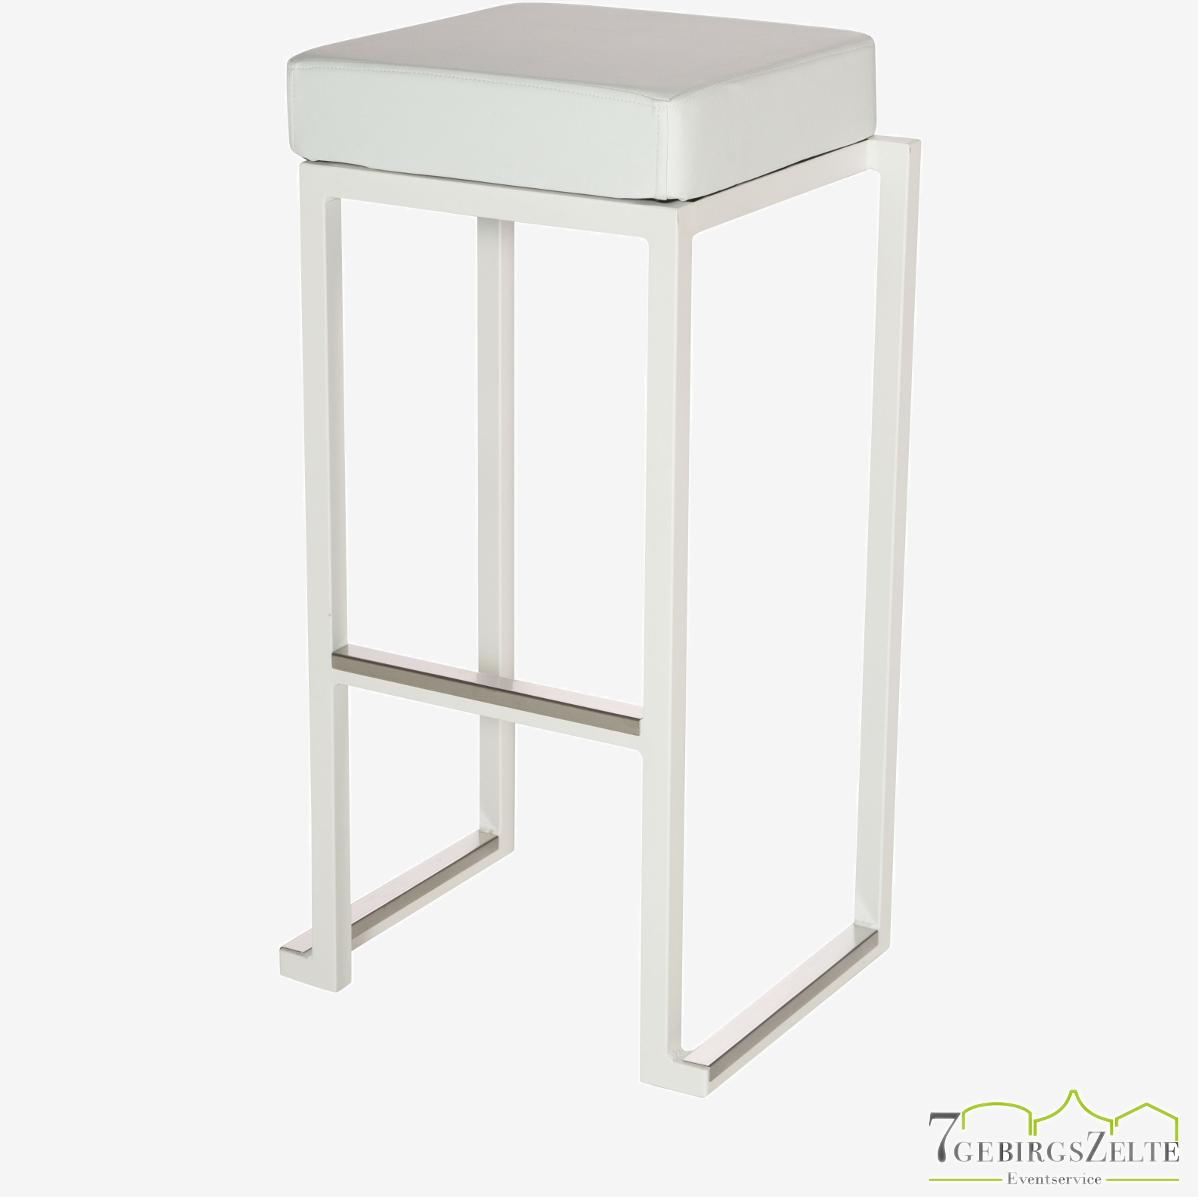 Kubo Smart stool 35x35x79cm alu Gestell: Farbe variabel; Sitz: variabel